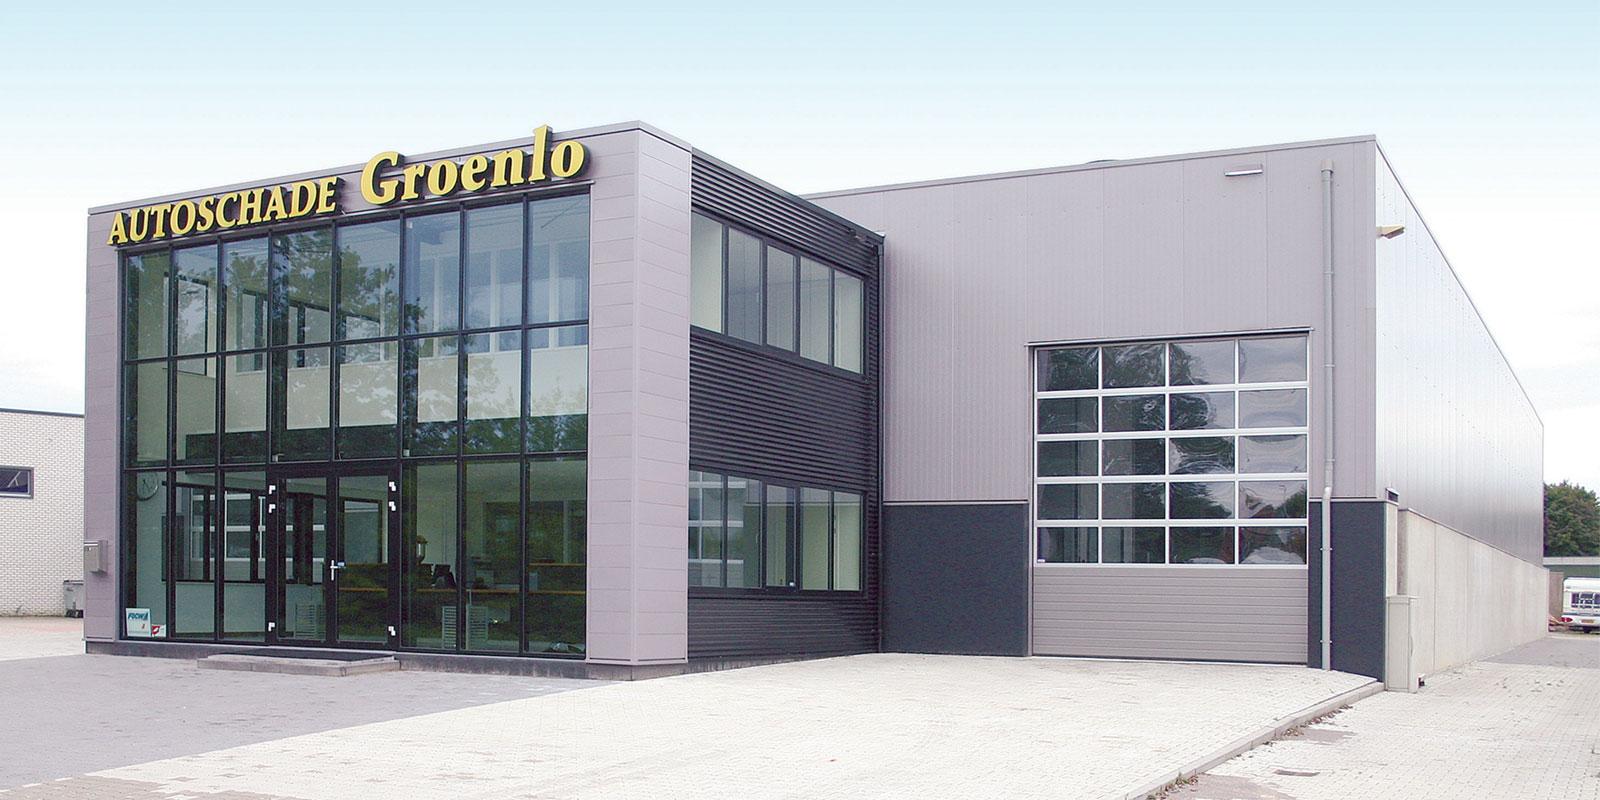 Autoschade Groenlo Bedrijfspand